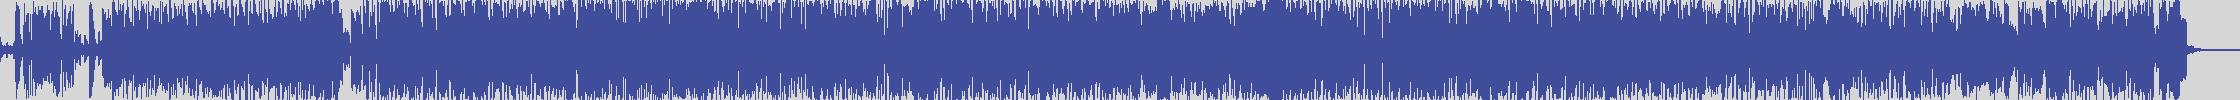 smilax_dig_records [SDR001] Muy Lejos - La Criminal [Original Mix] audio wave form